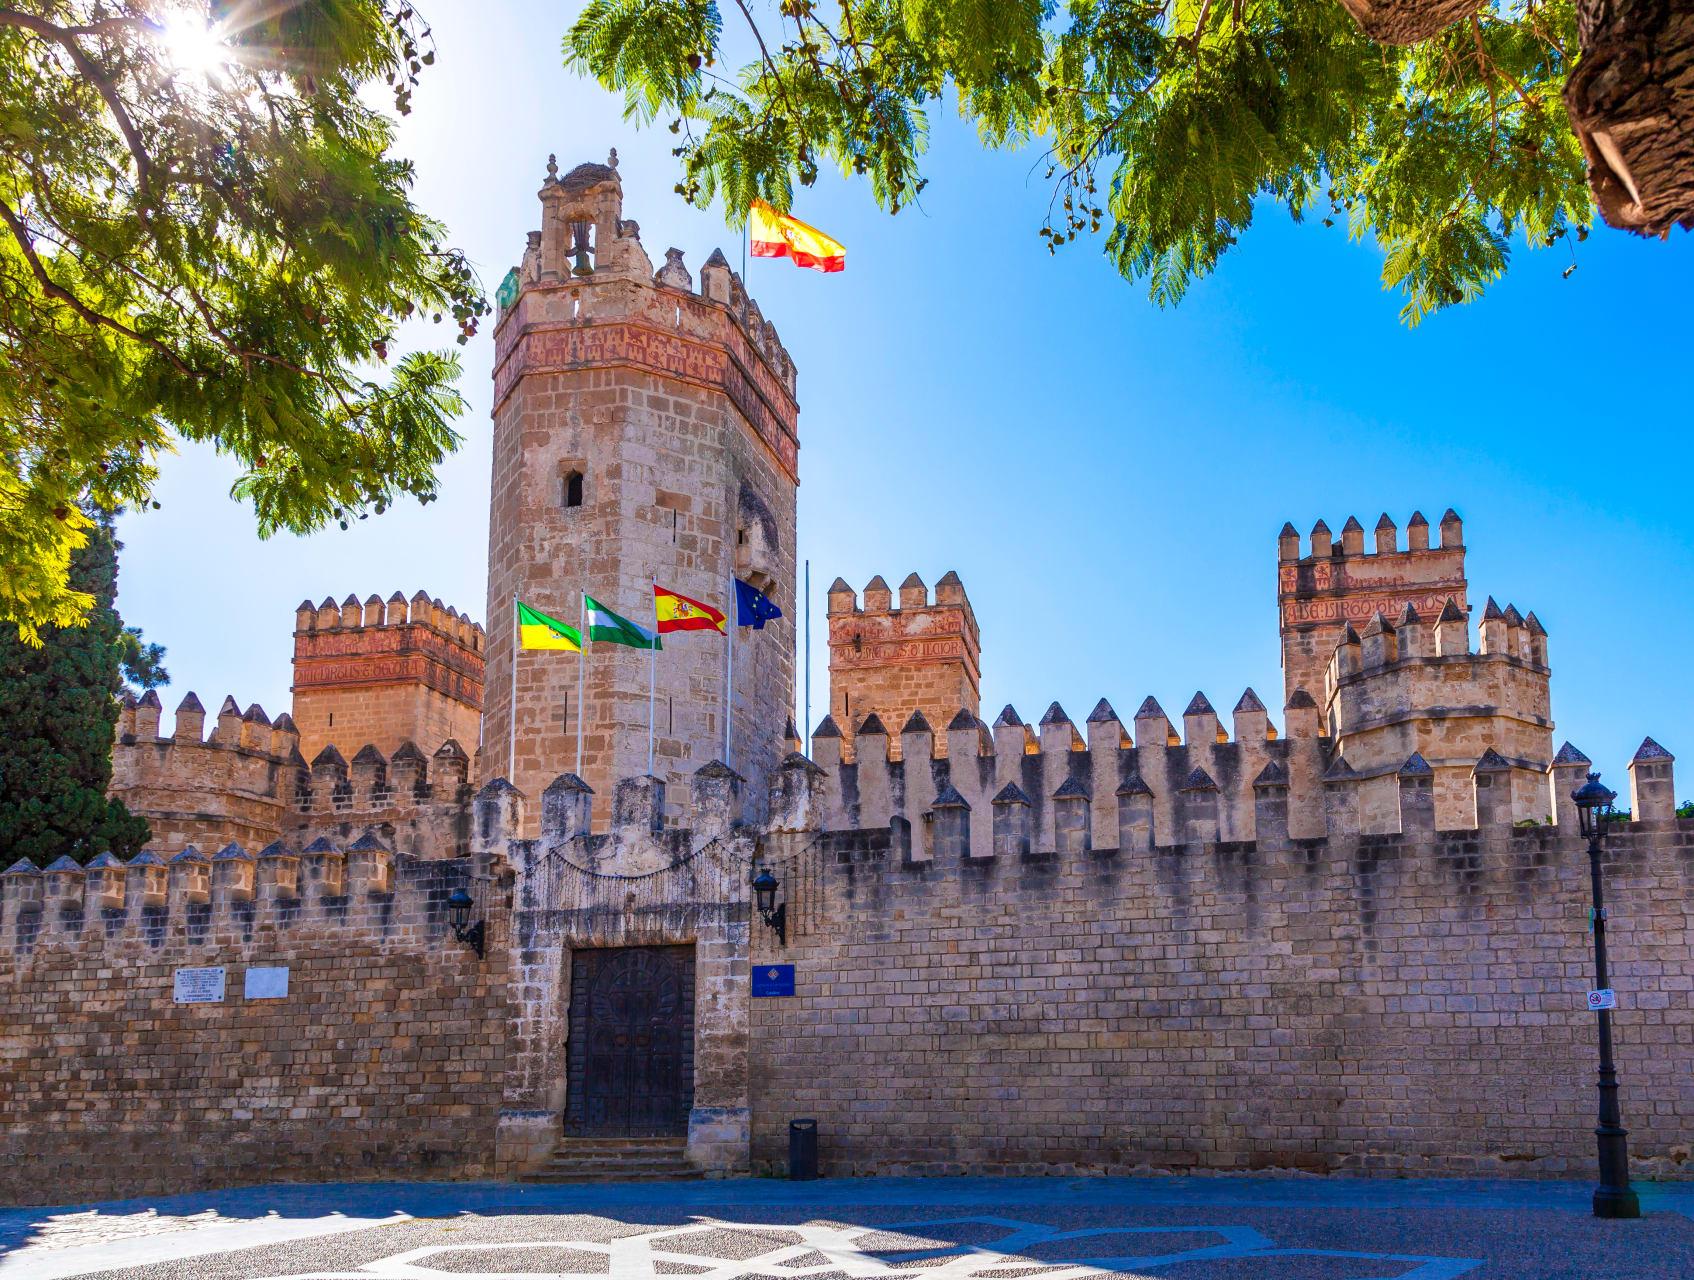 Cádiz - El Puerto de Santa Maria, the city of 100 Palaces